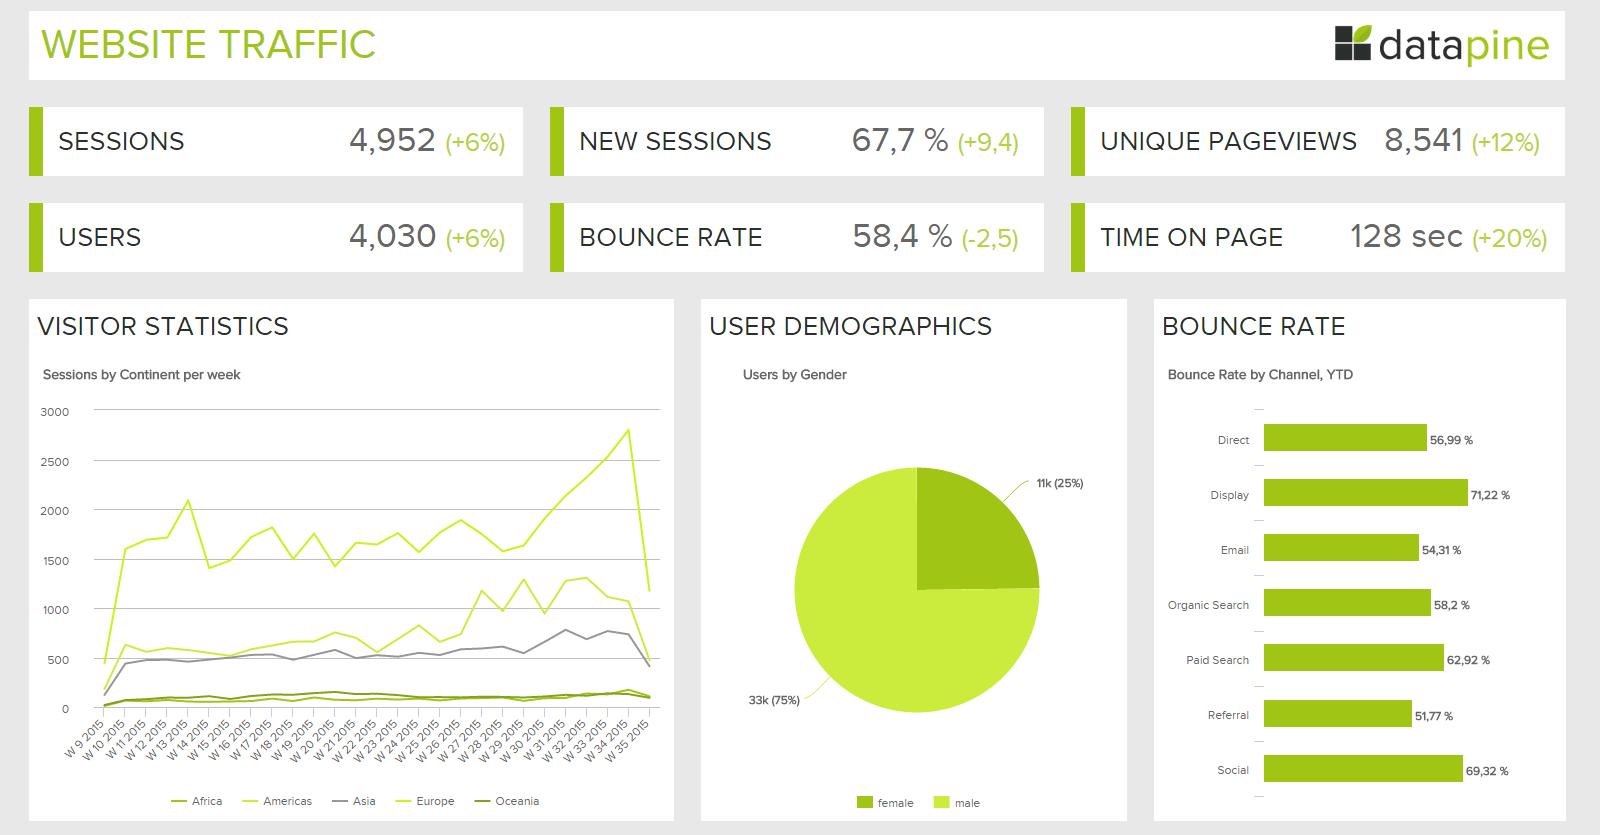 Branded dashboard from datapine